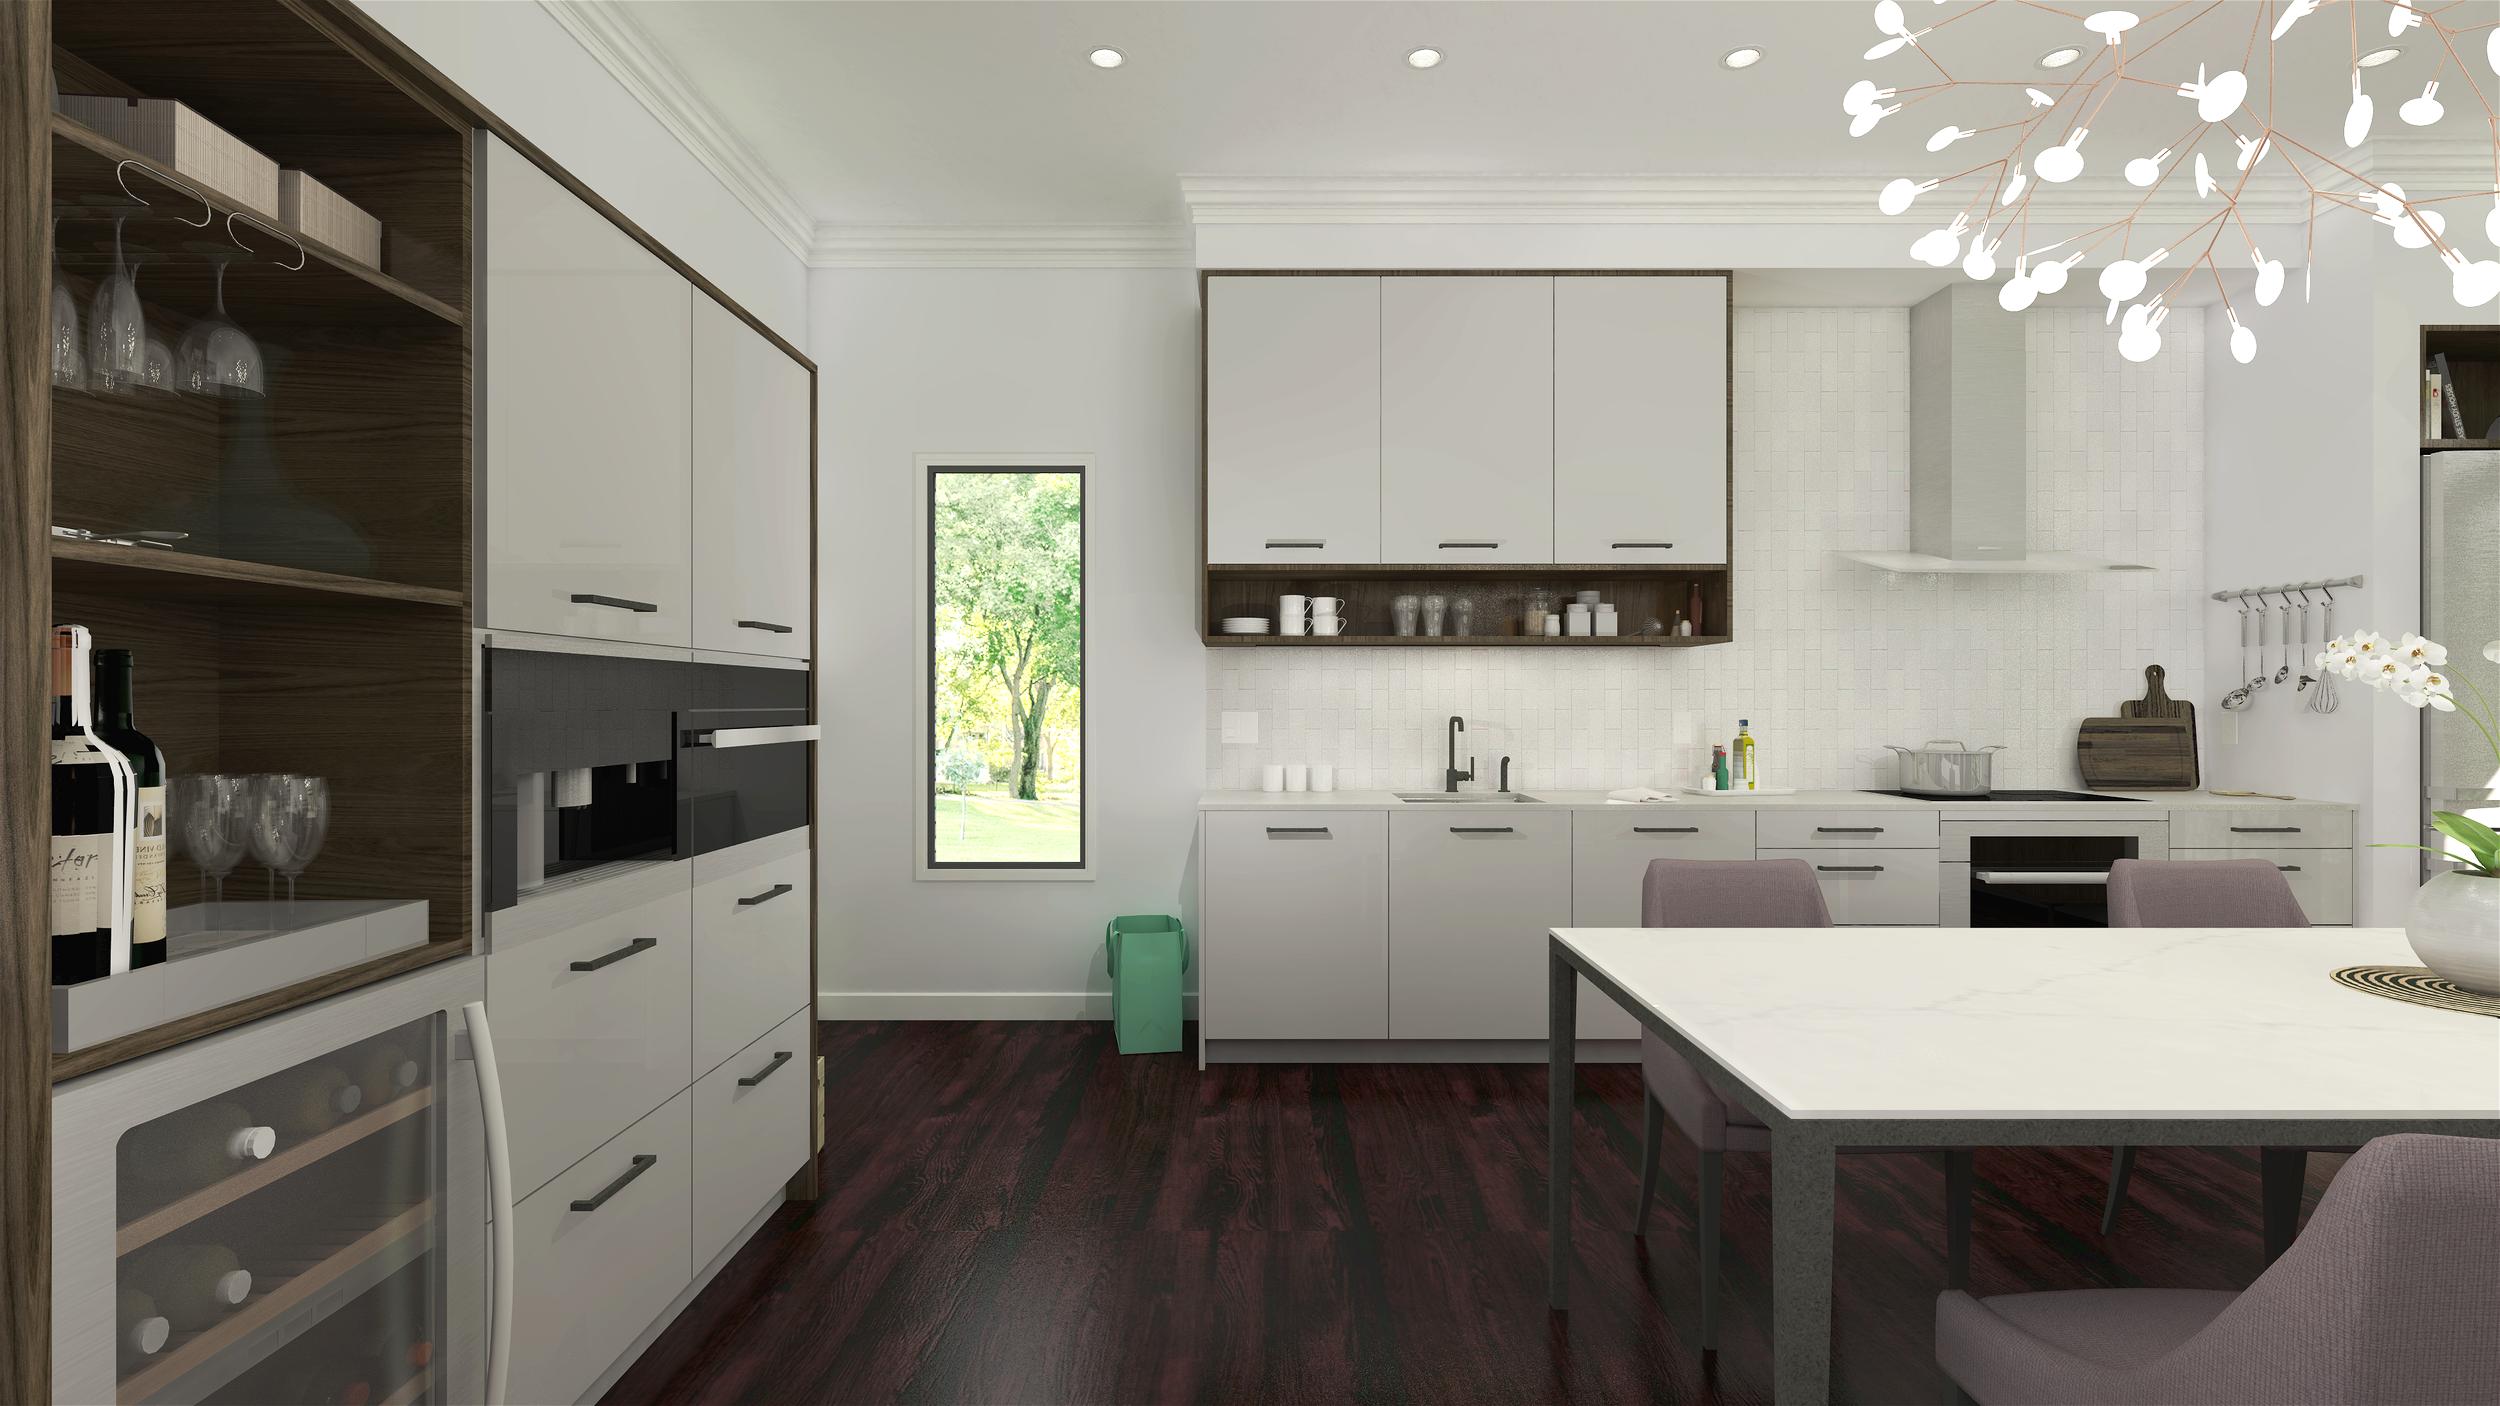 deSousaDESIGN_Kitchen_Metro_House_V1d_3840x2160.png